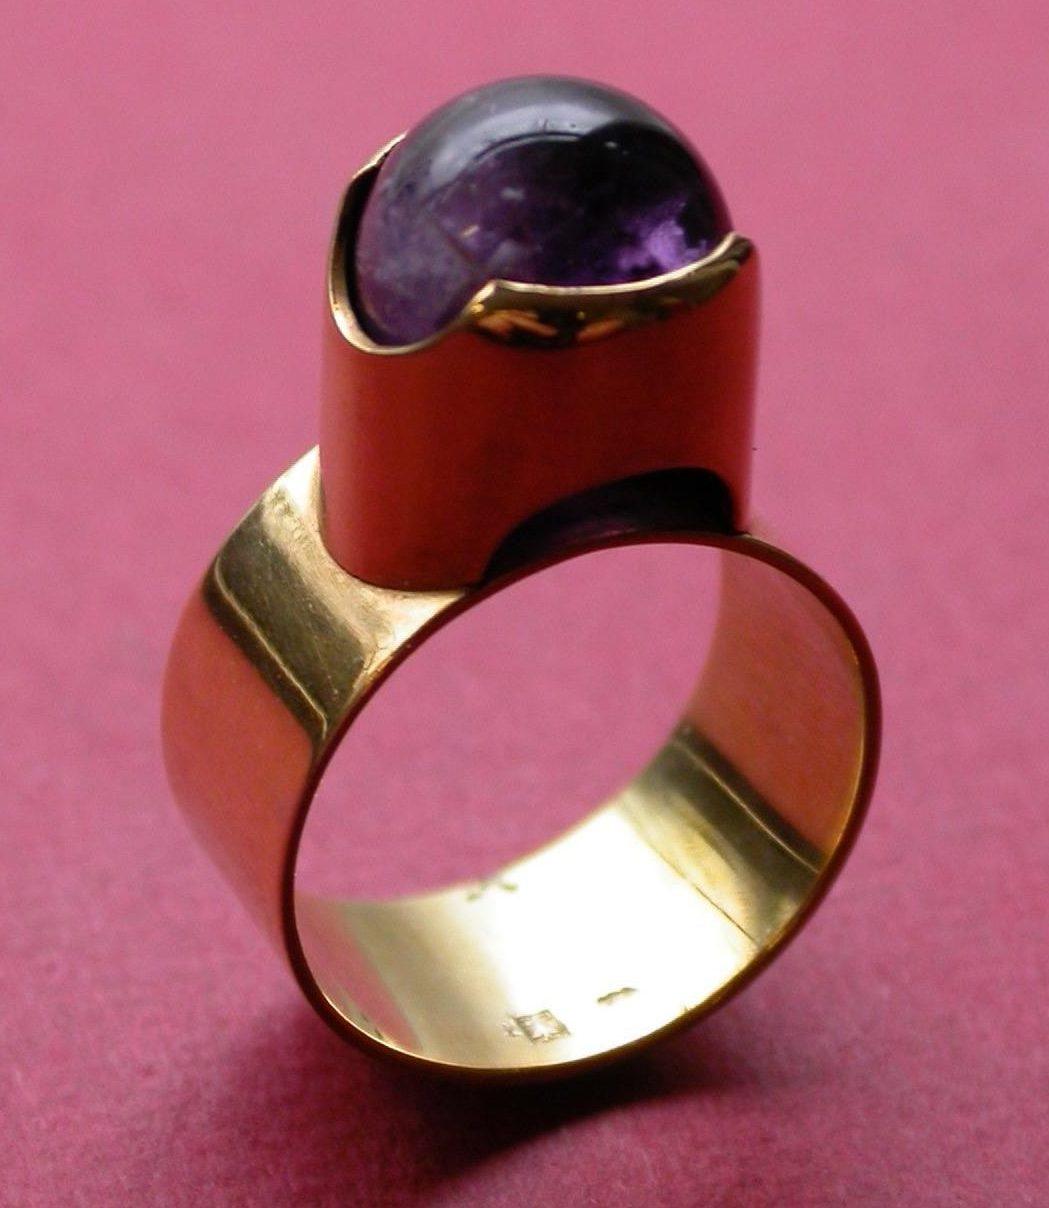 Riet Neerincx, ring, 1966, goud, amethist